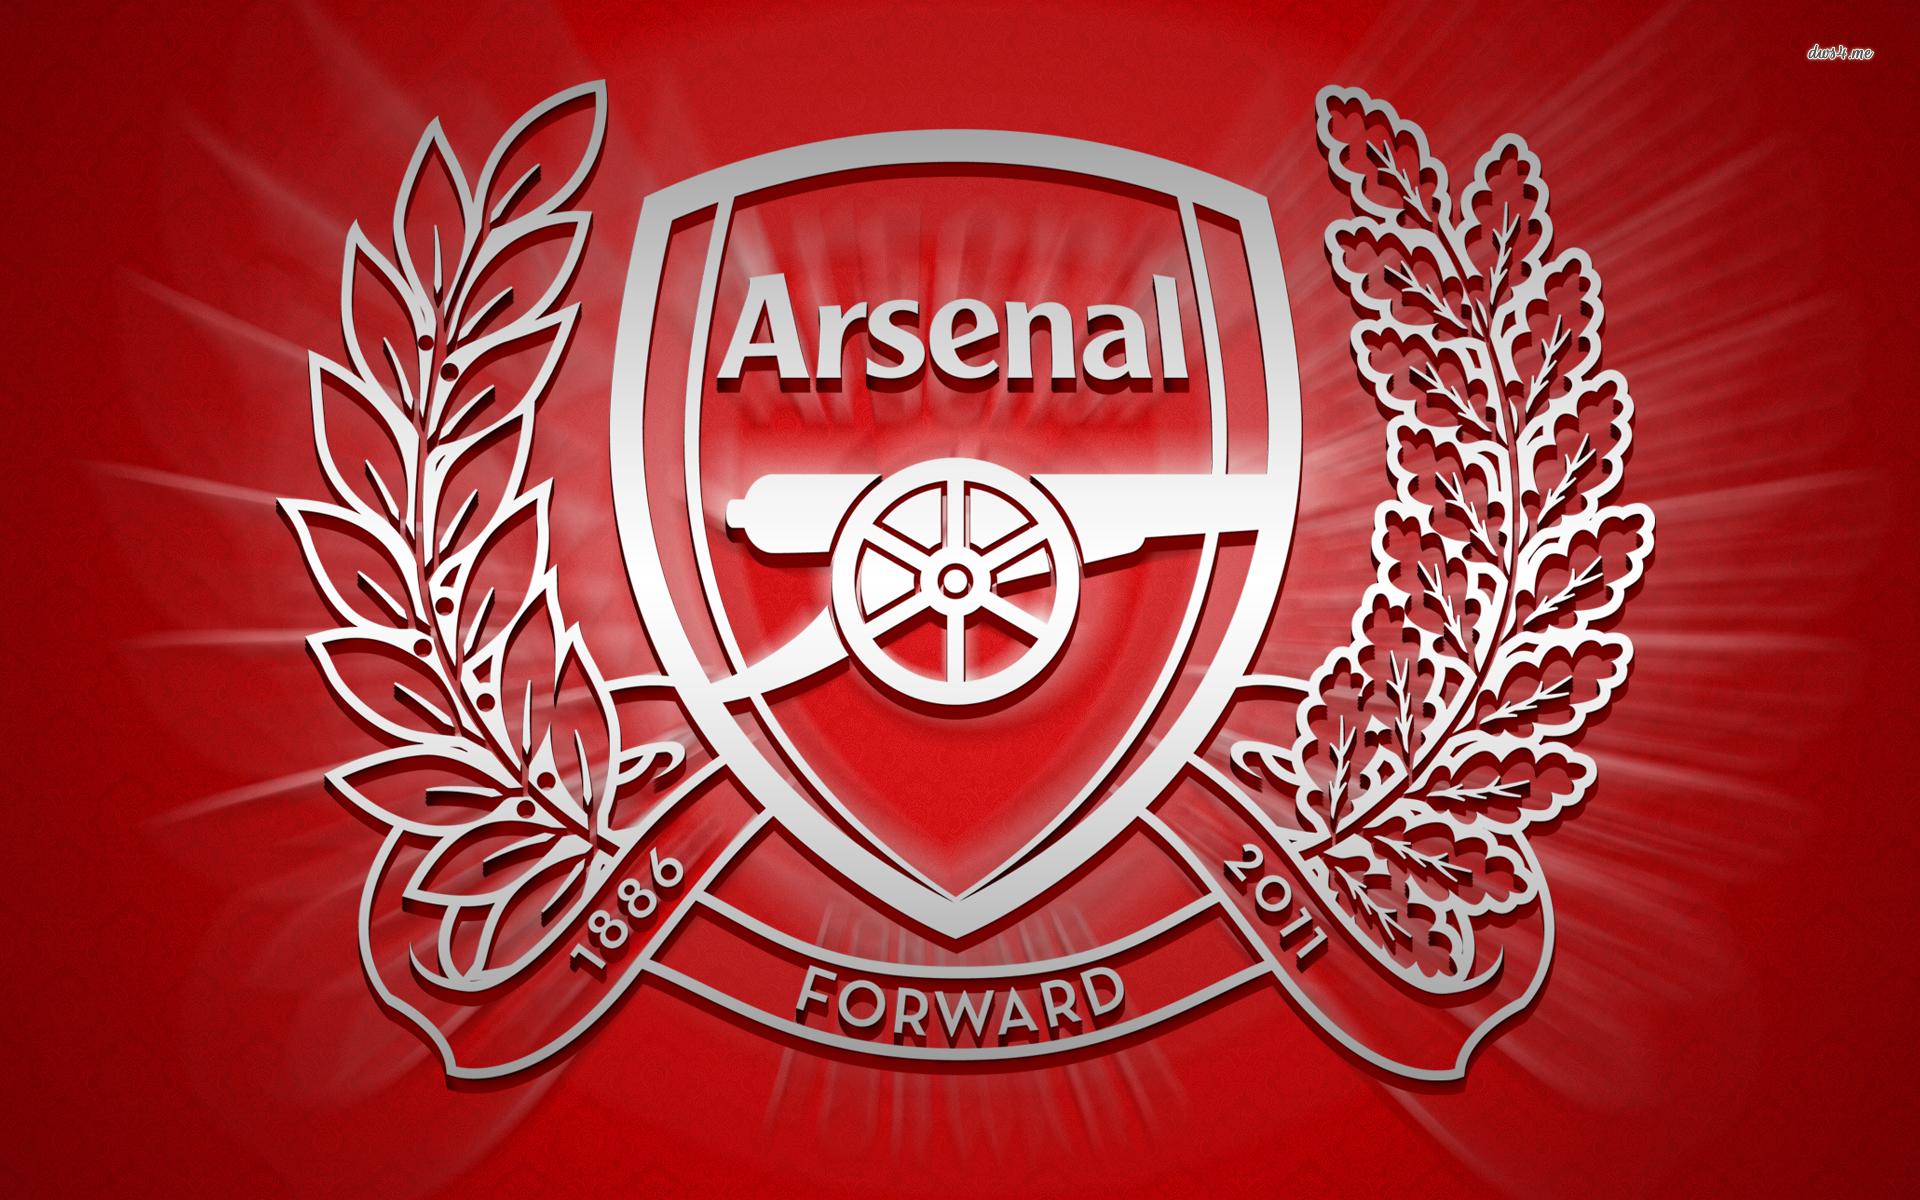 Arsenal FC logo wallpaper   Sport wallpapers   7381 1920x1200